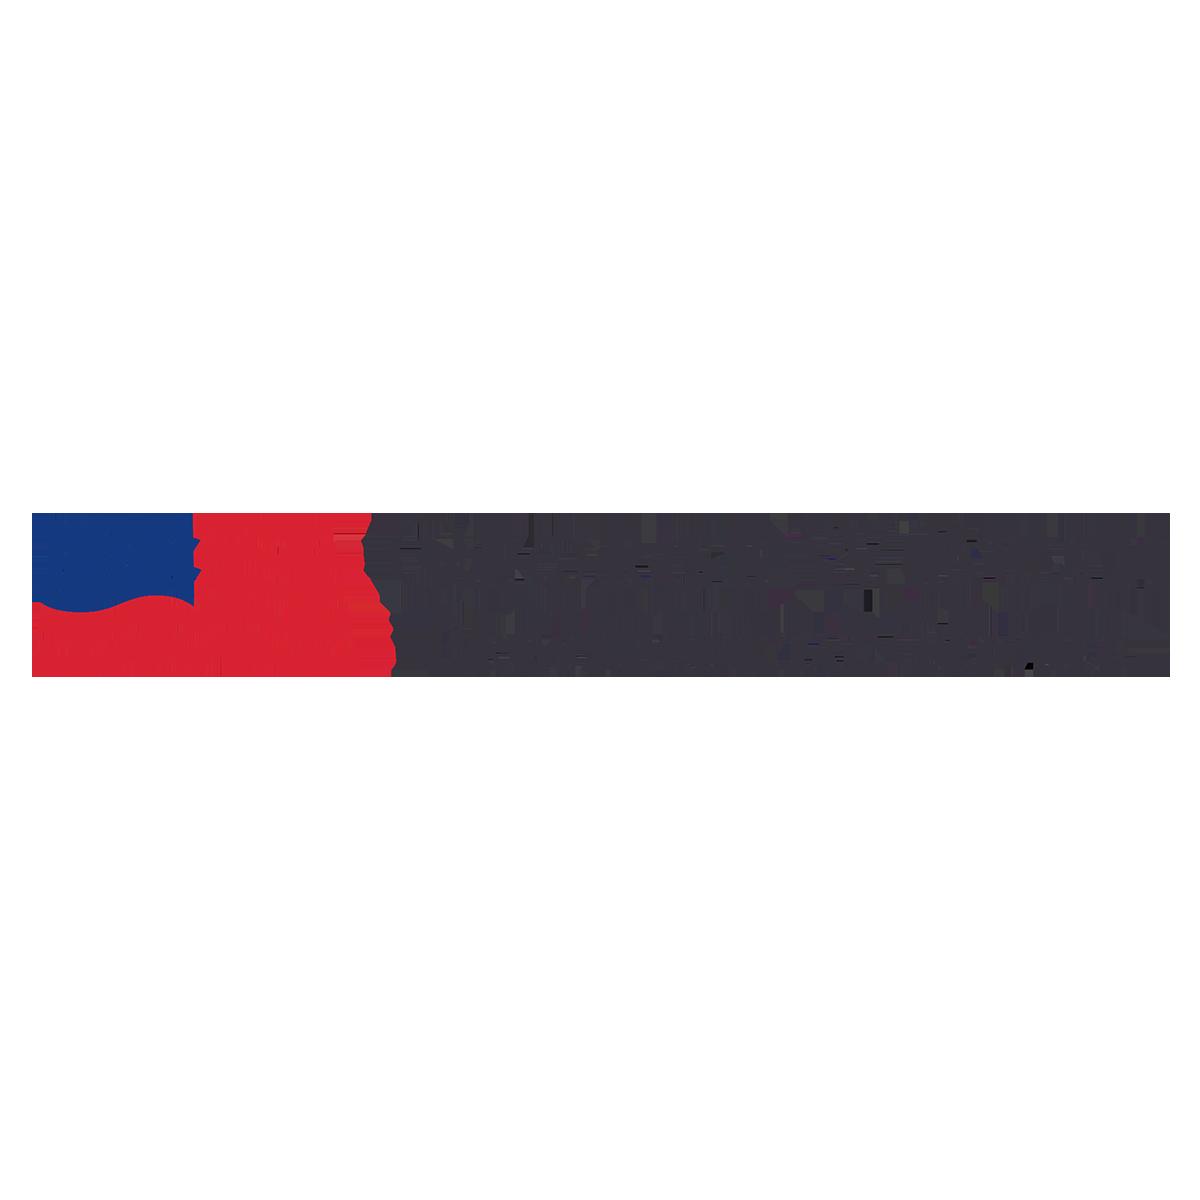 SQ-george-bush-ctr.png